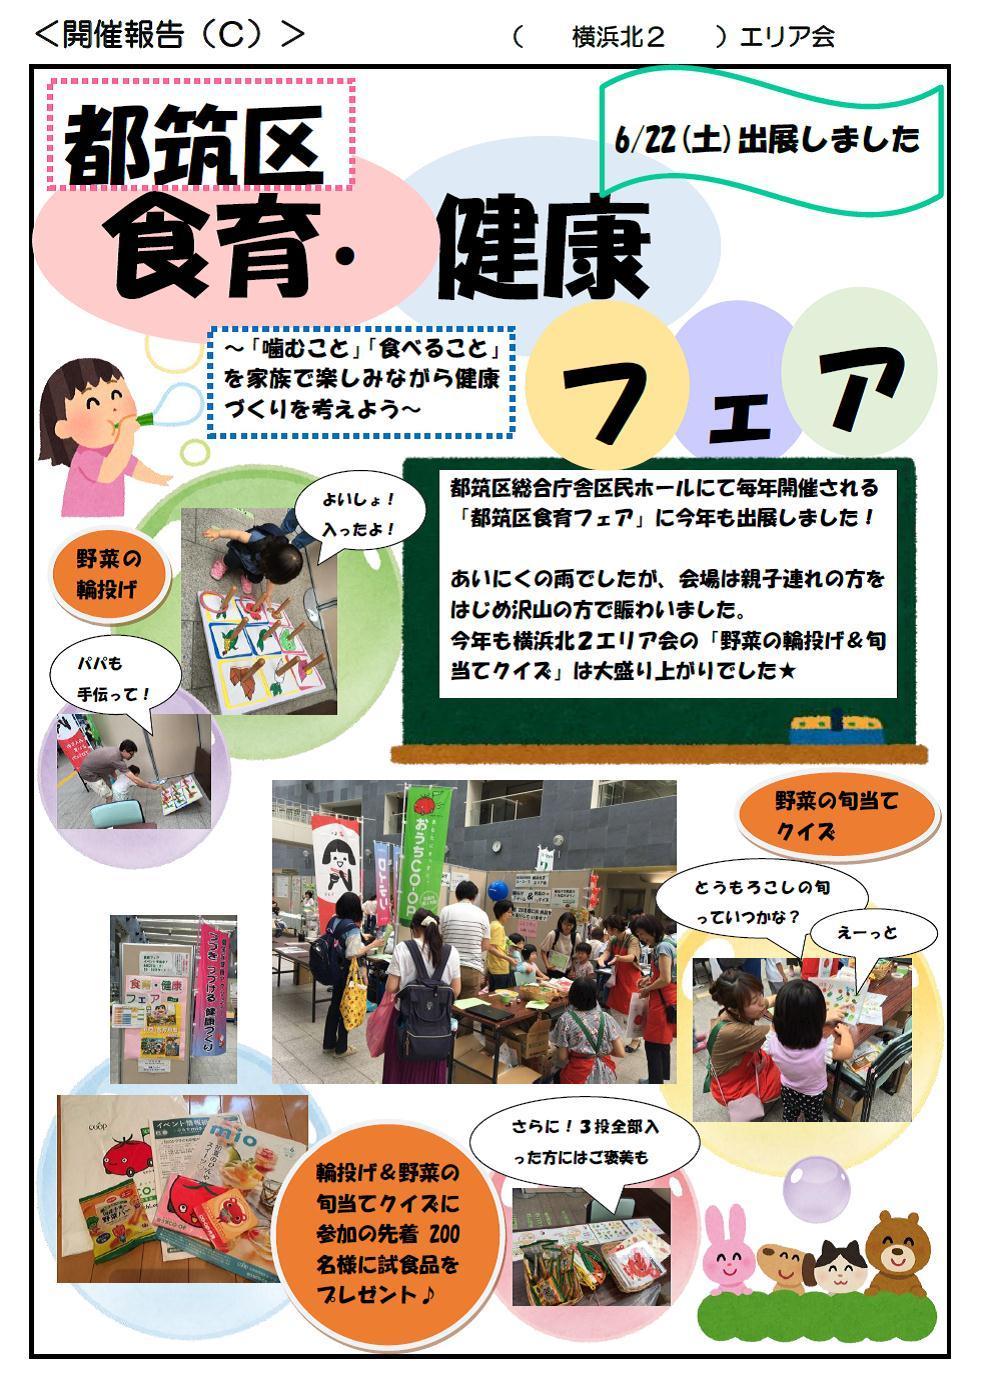 https://kanagawa.ucoop.or.jp/hiroba/areanews/files/20190622yokohamakita2%20syokuikuhuxea.jpg